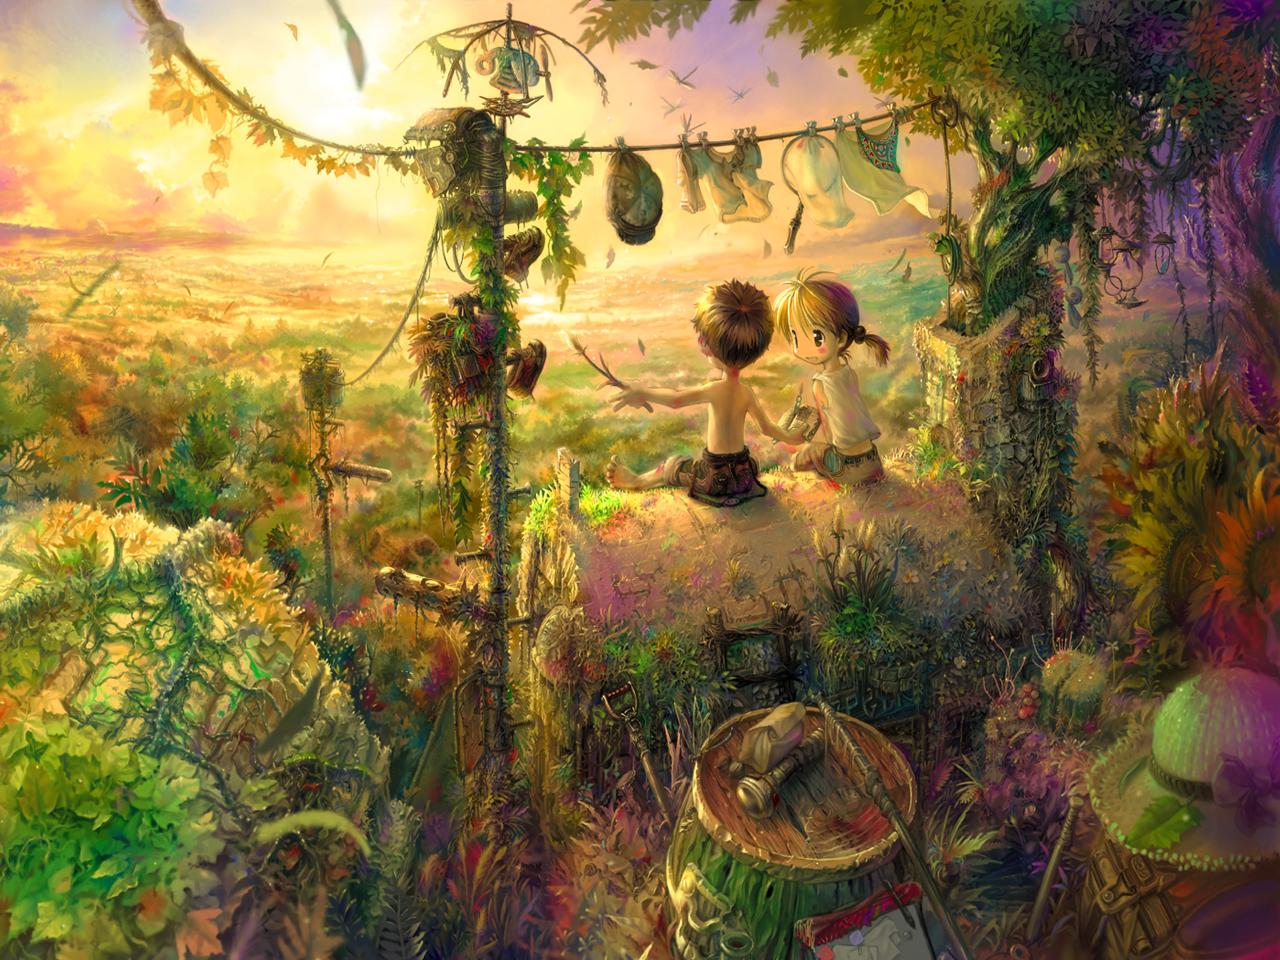 Аниме: Мальчик, Девочка, беседа, игра, природа, закат.